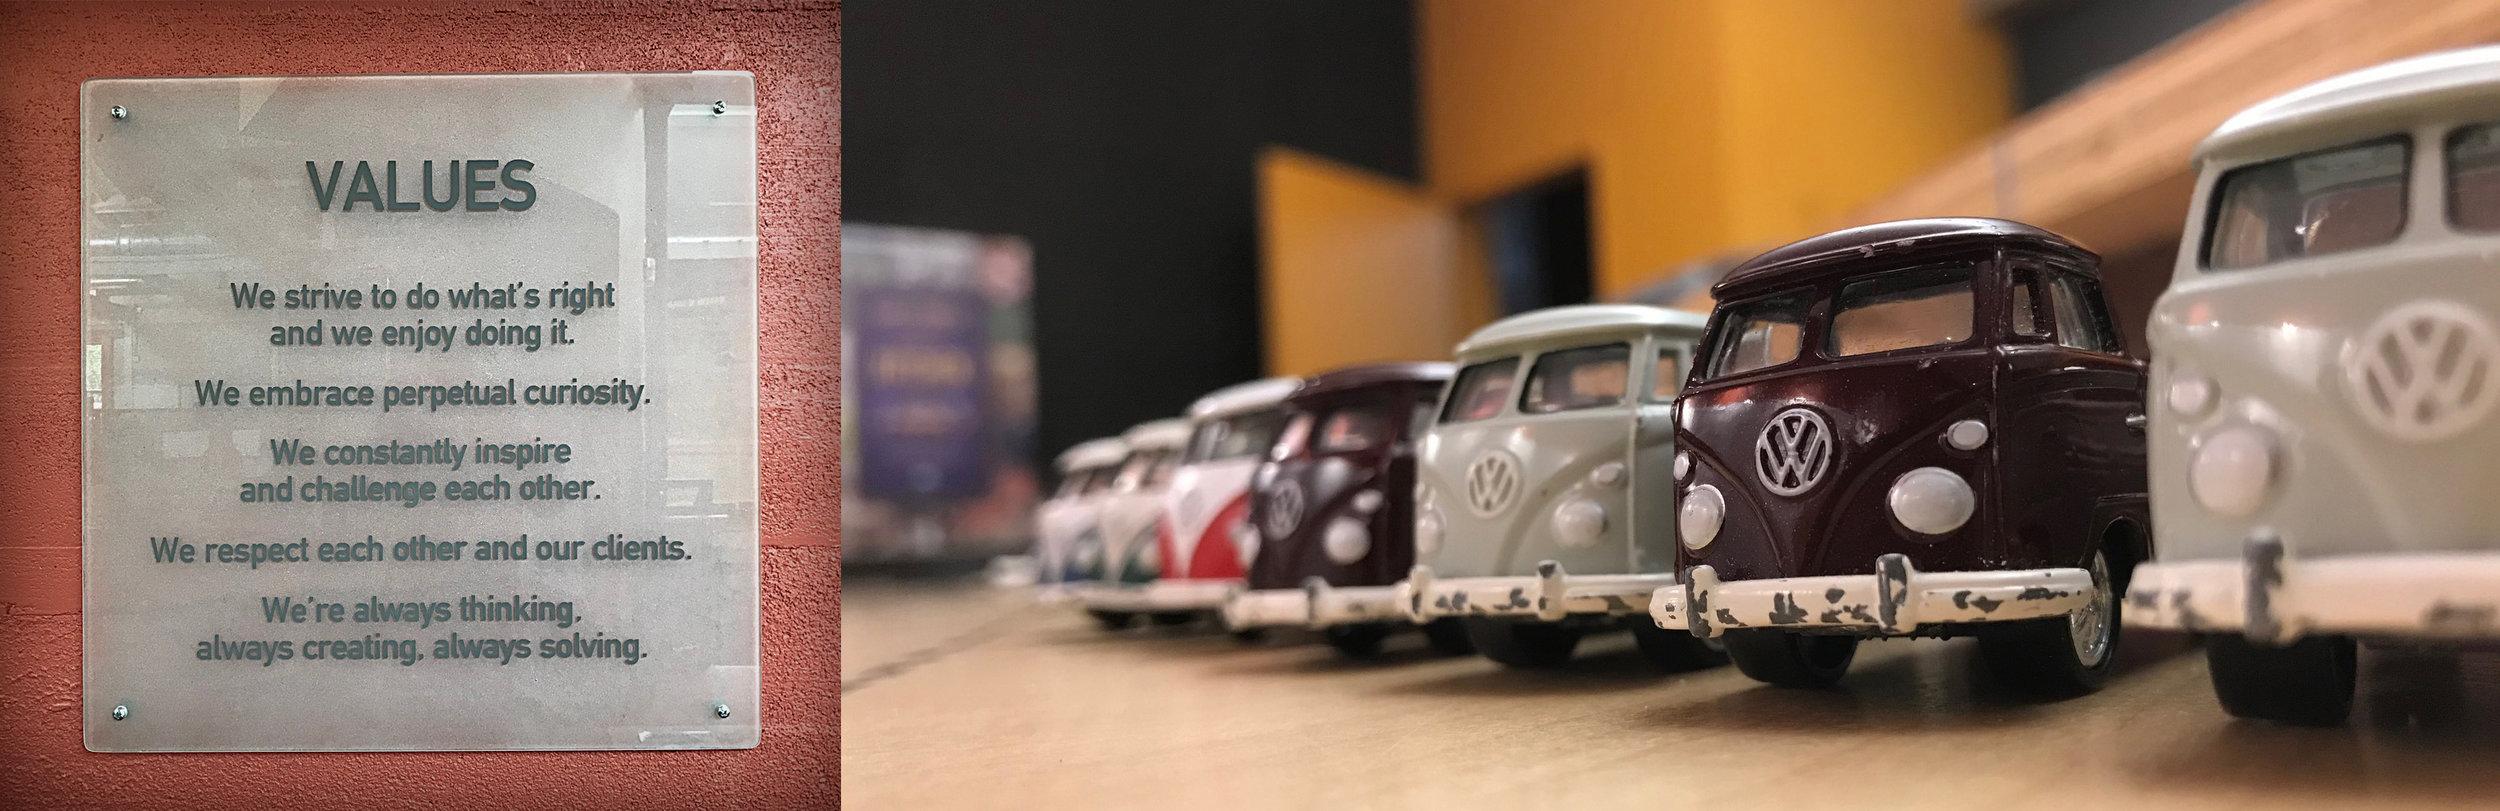 Values_VW.jpg